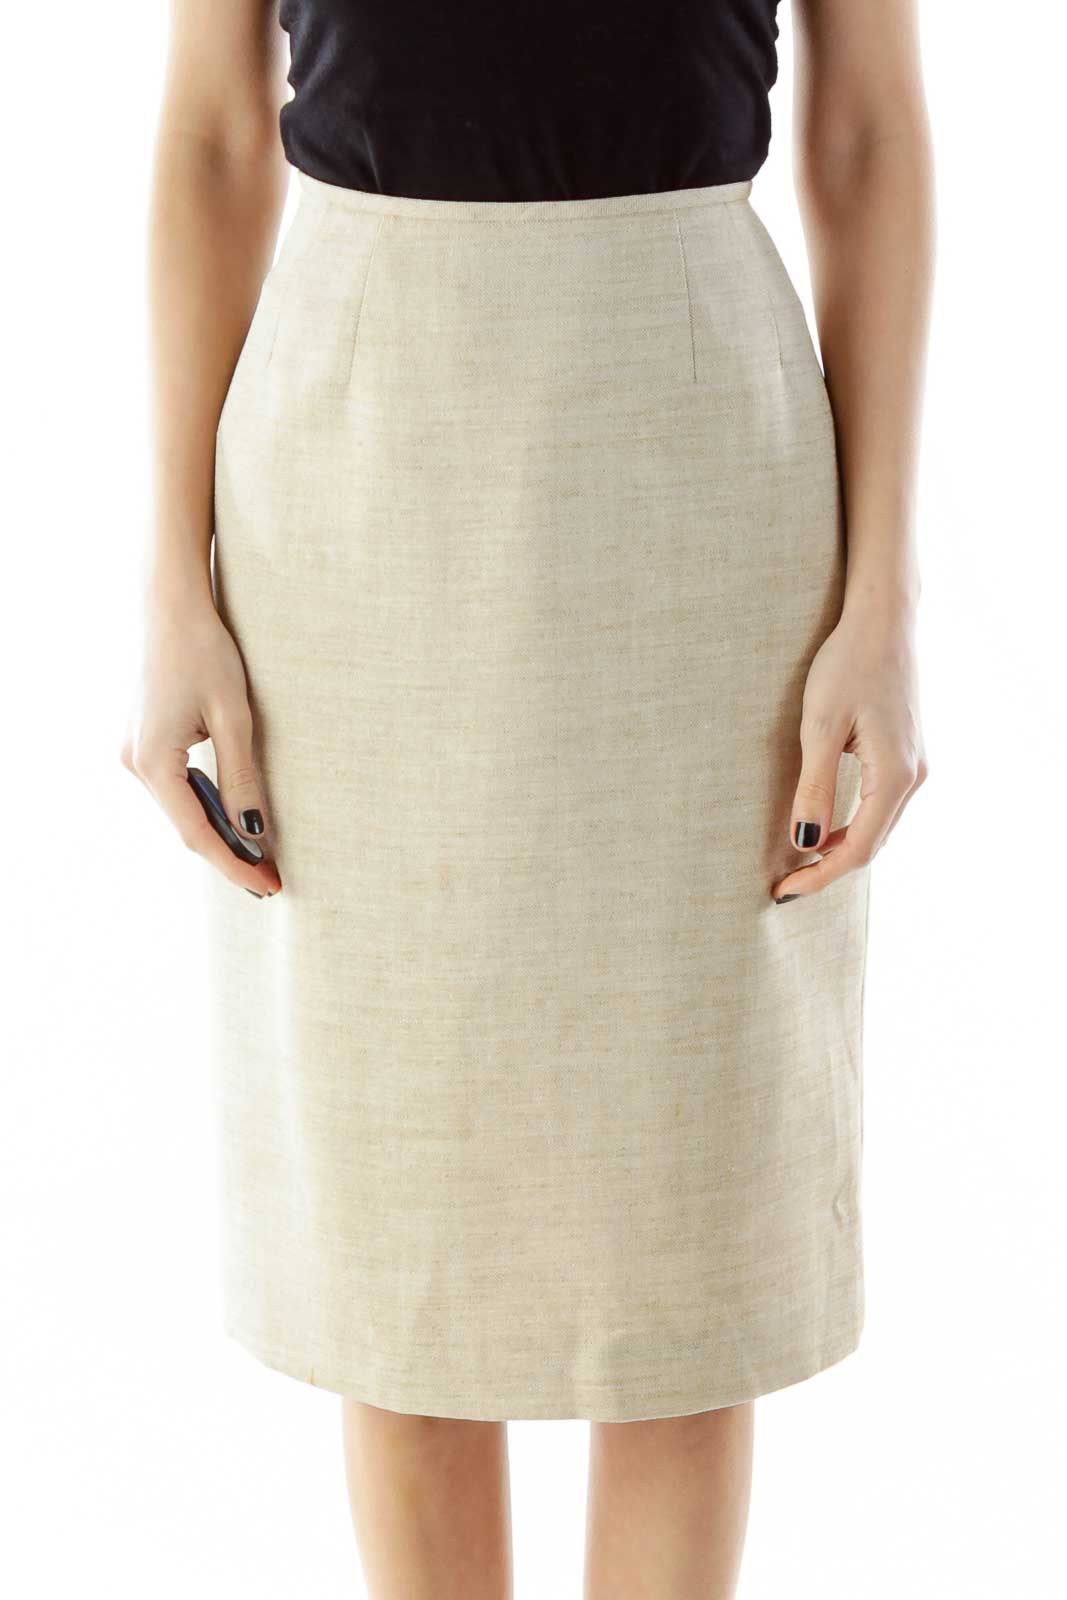 Beige Mottled Pencil Skirt Front